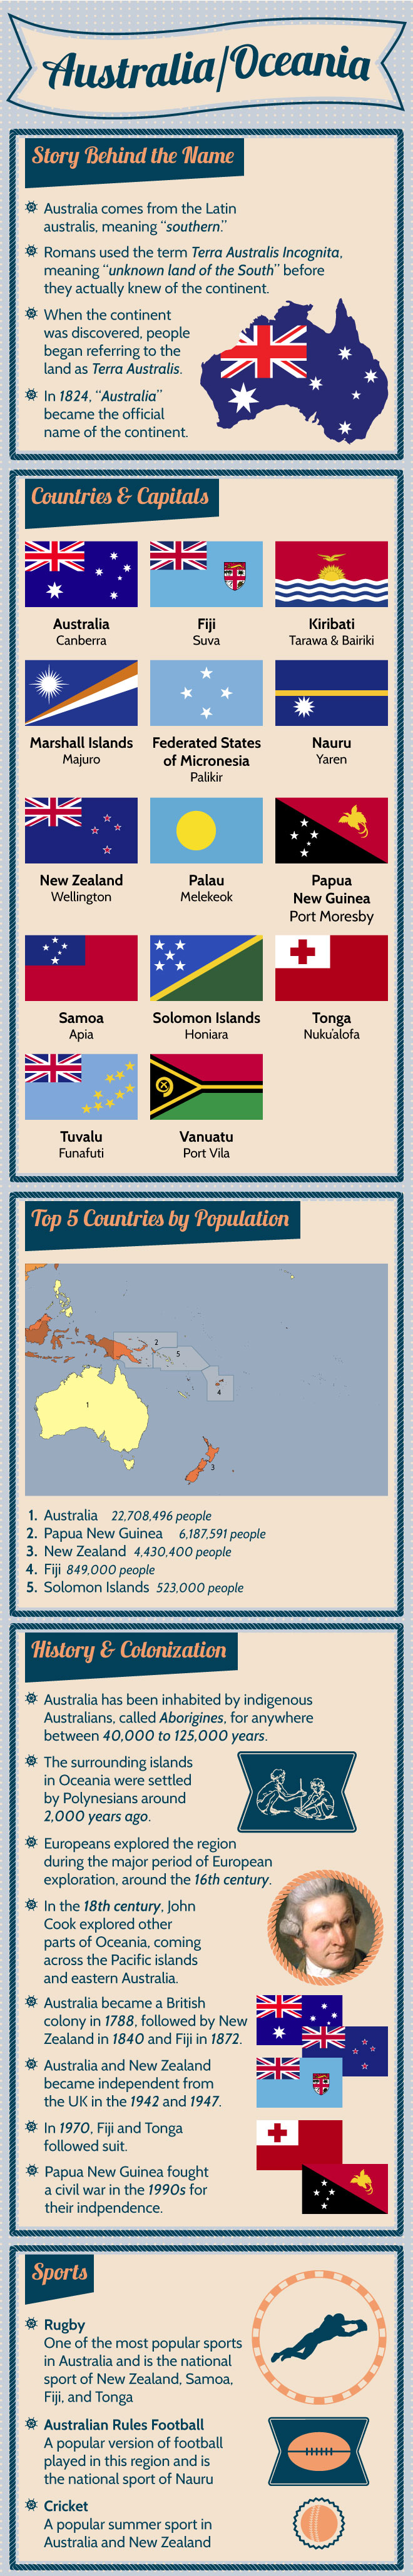 australia-oceania-fast-facts-infographic